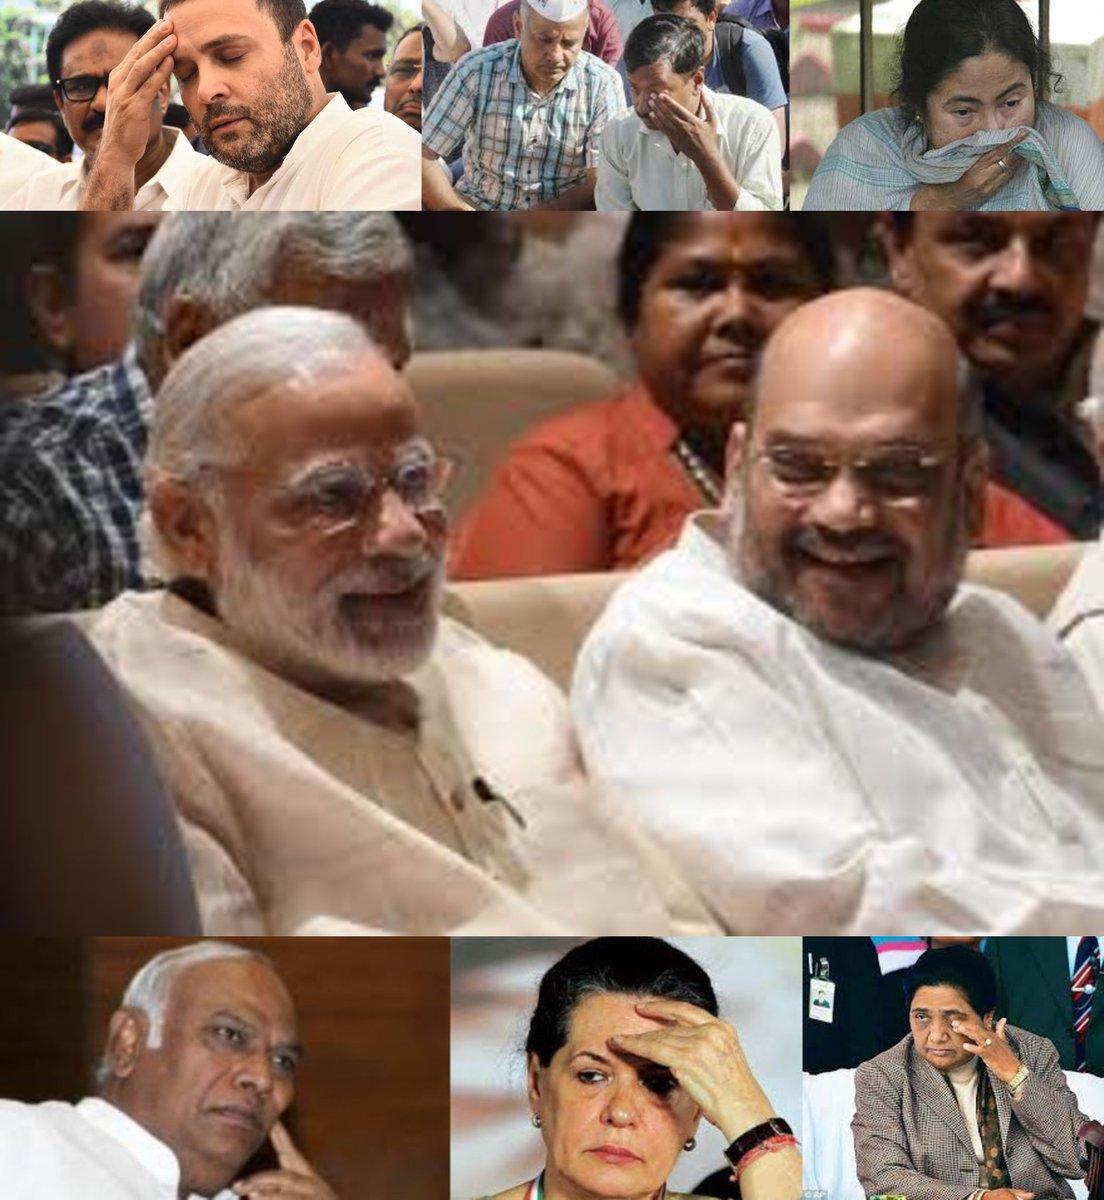 """कितने आदमी थे?"" ""सरदार 2! एक PM Modi और दूसरा Amit Shah!' ""अरे ओ सांबा, पूरा का पूरा धो डाला क्या...?"" 😃 #IndiaDecides2019 #IndiaDecides #ModiPhirSe #ModiSweep #ModiReturns #ModiTsunami #TsuNaMo #TsuNaMo2019"